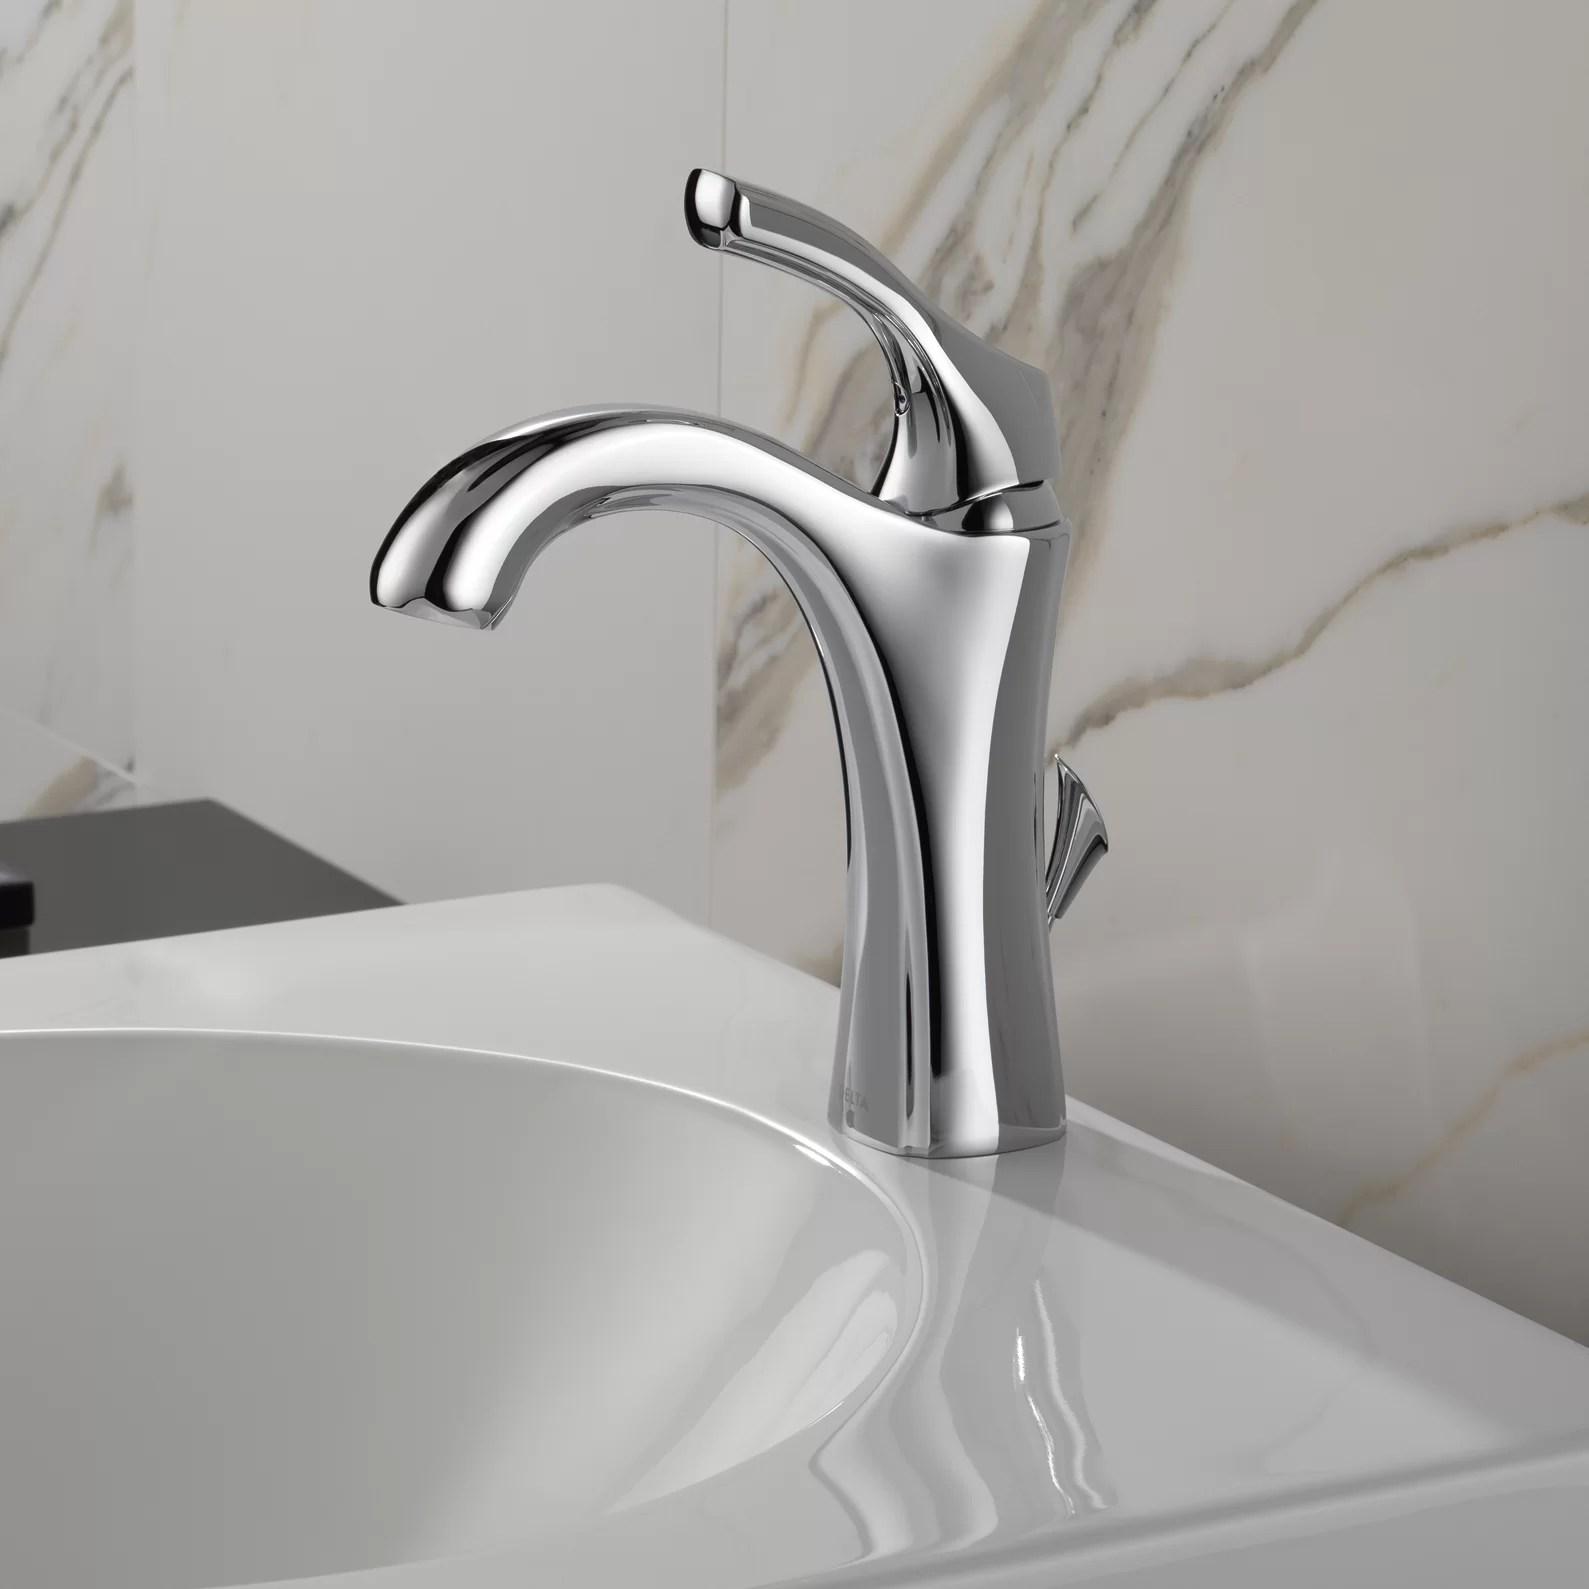 Delta Addison Single Hole Bathroom Faucet with Diamond